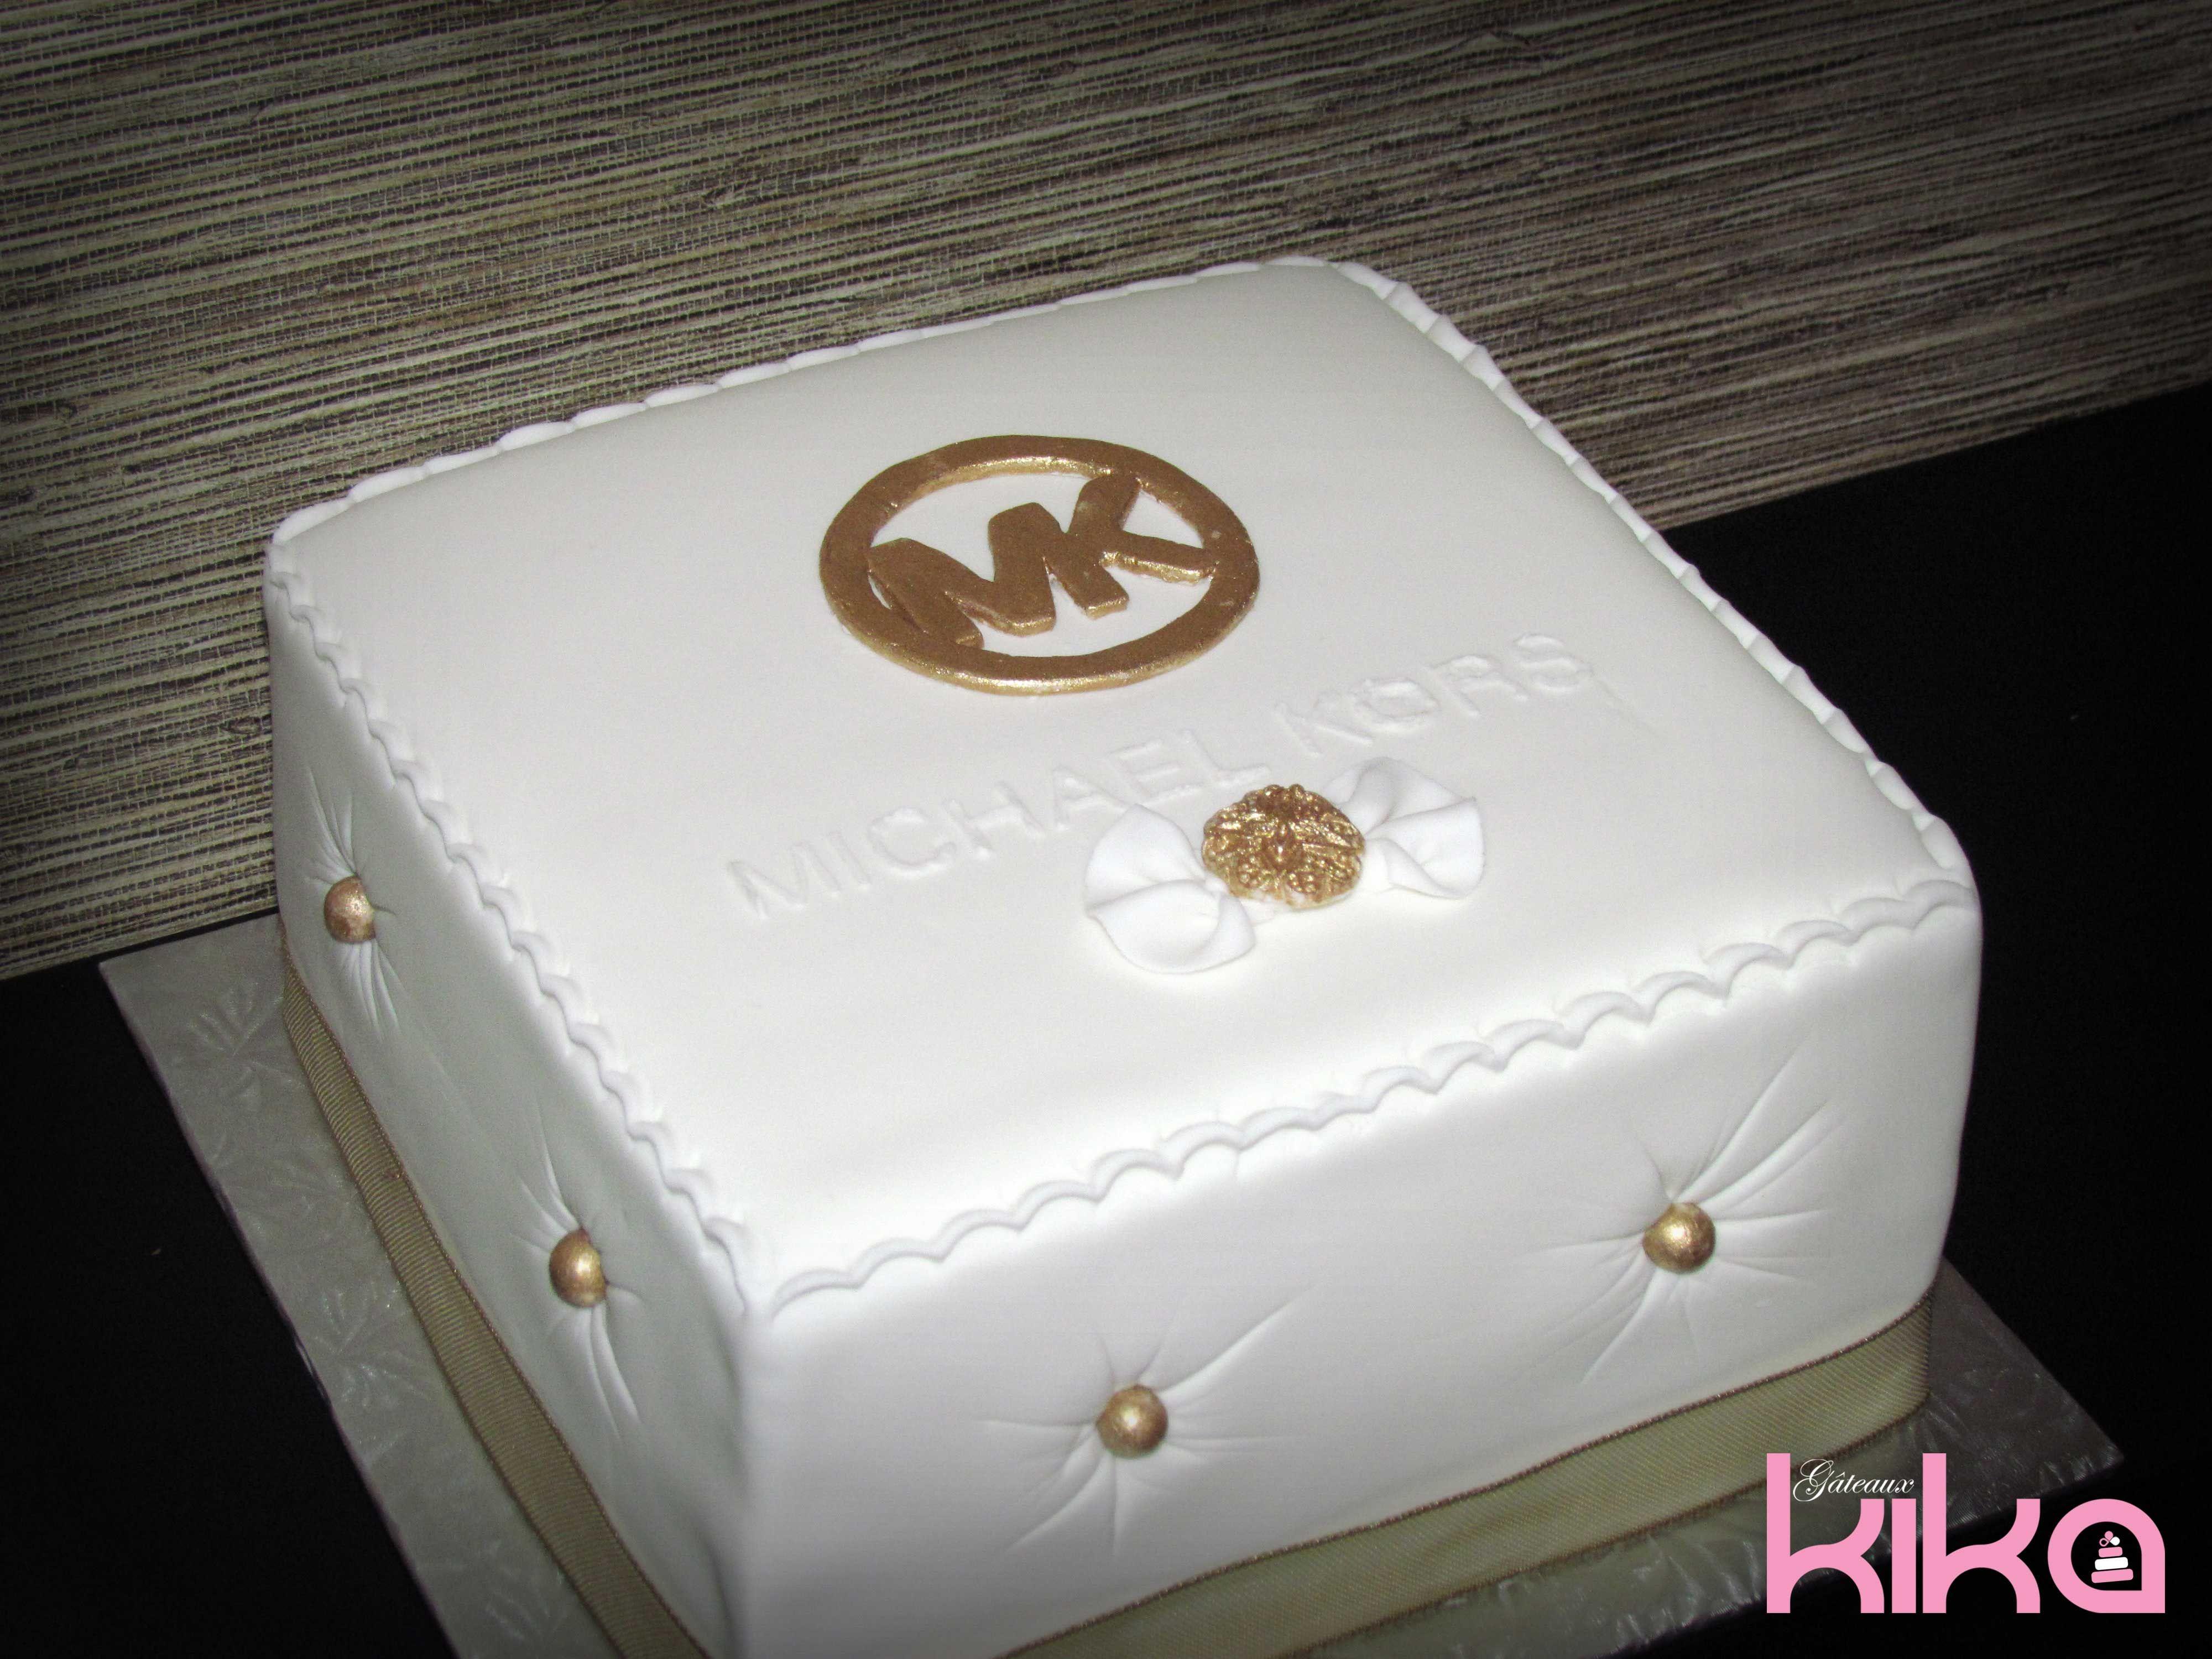 G 226 Teau Michael Kors Cake Cakes Fashionista Cake